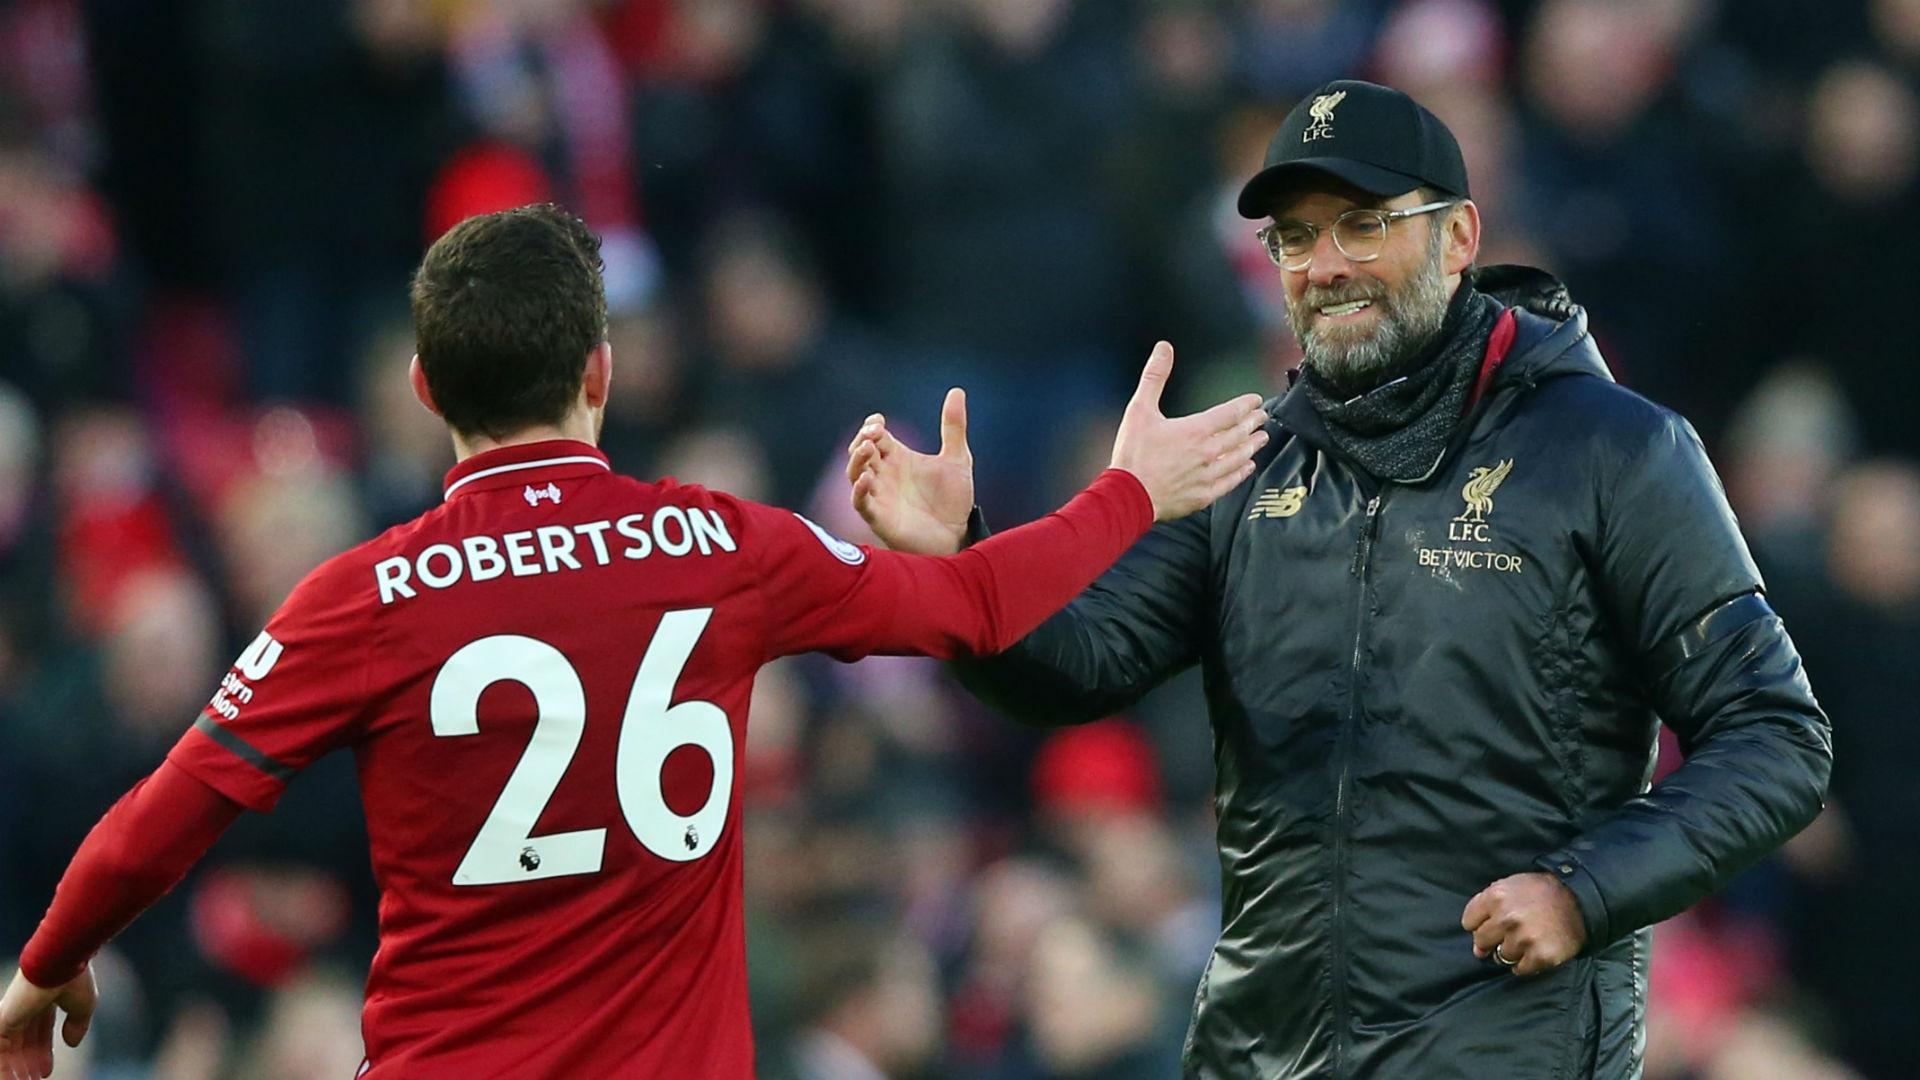 Lijnders: No pressure at Liverpool